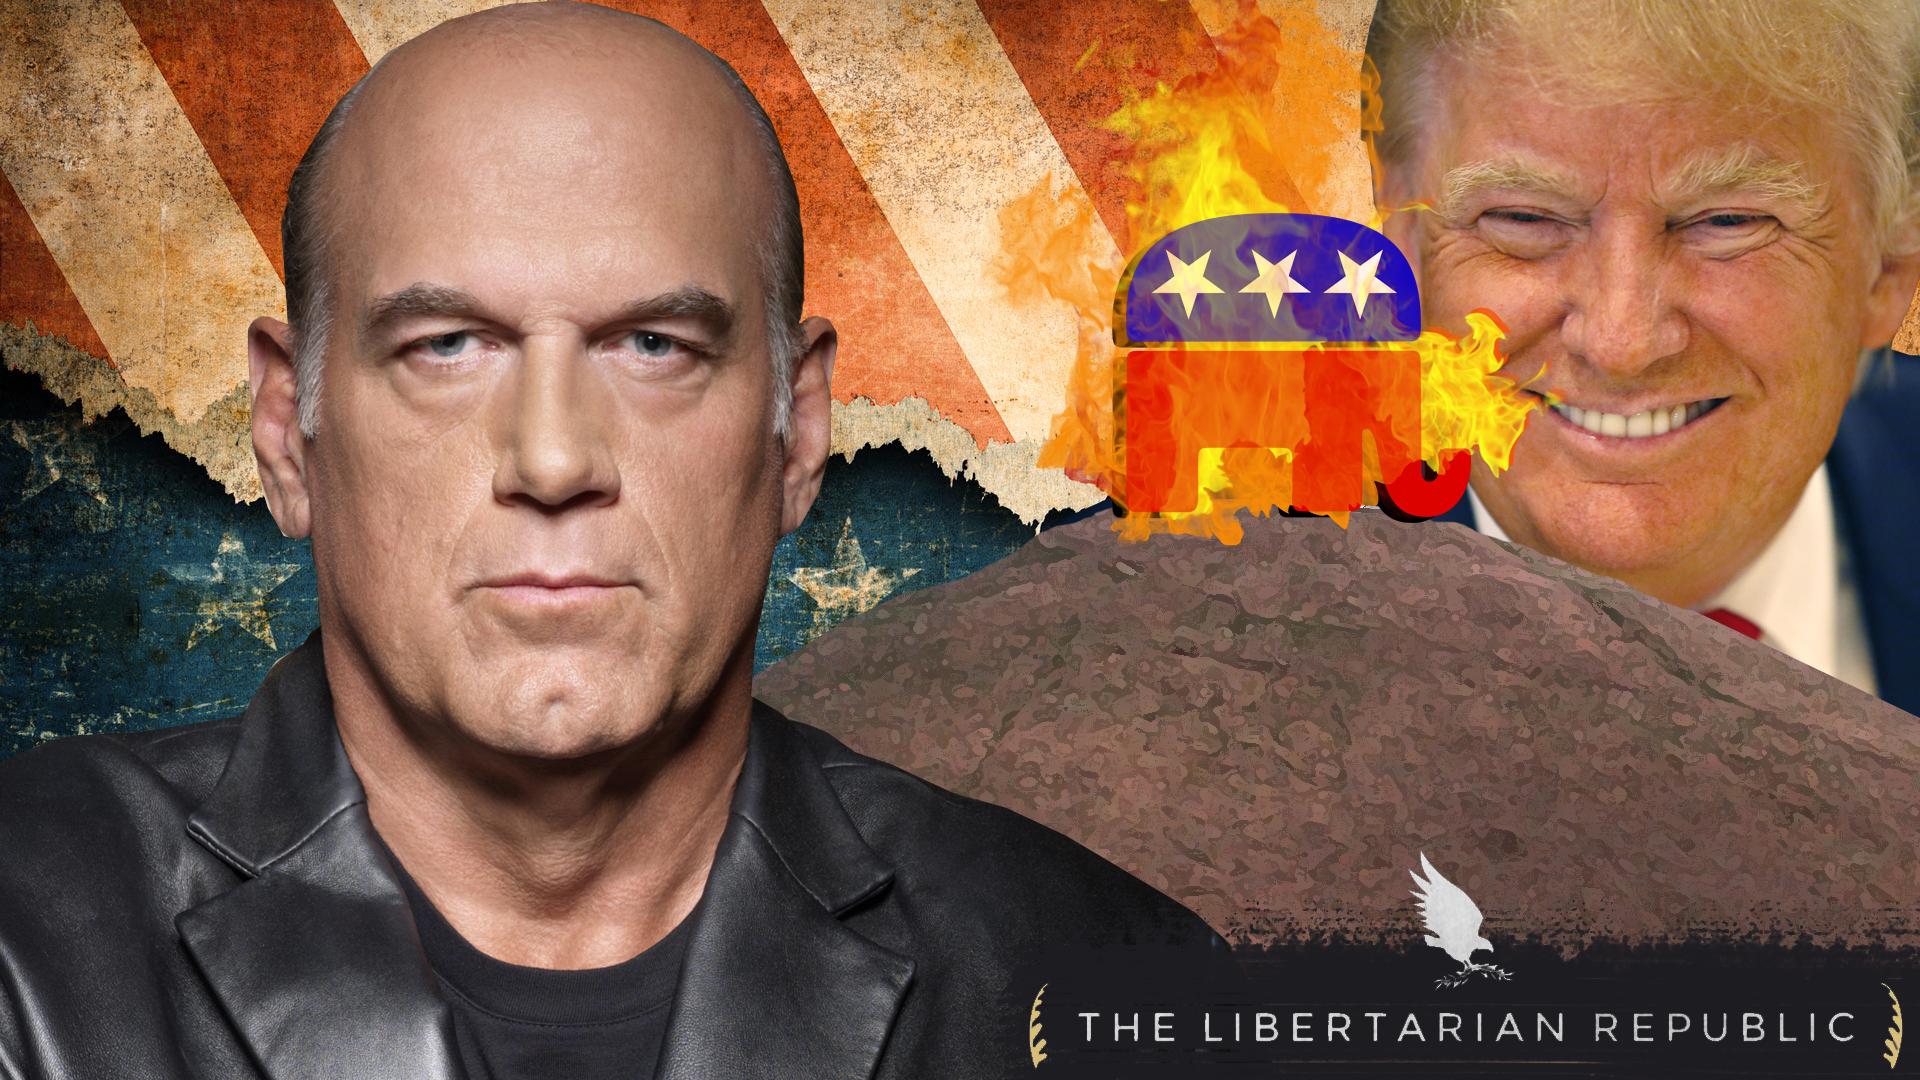 Jesse Ventura Trump Burning GOP